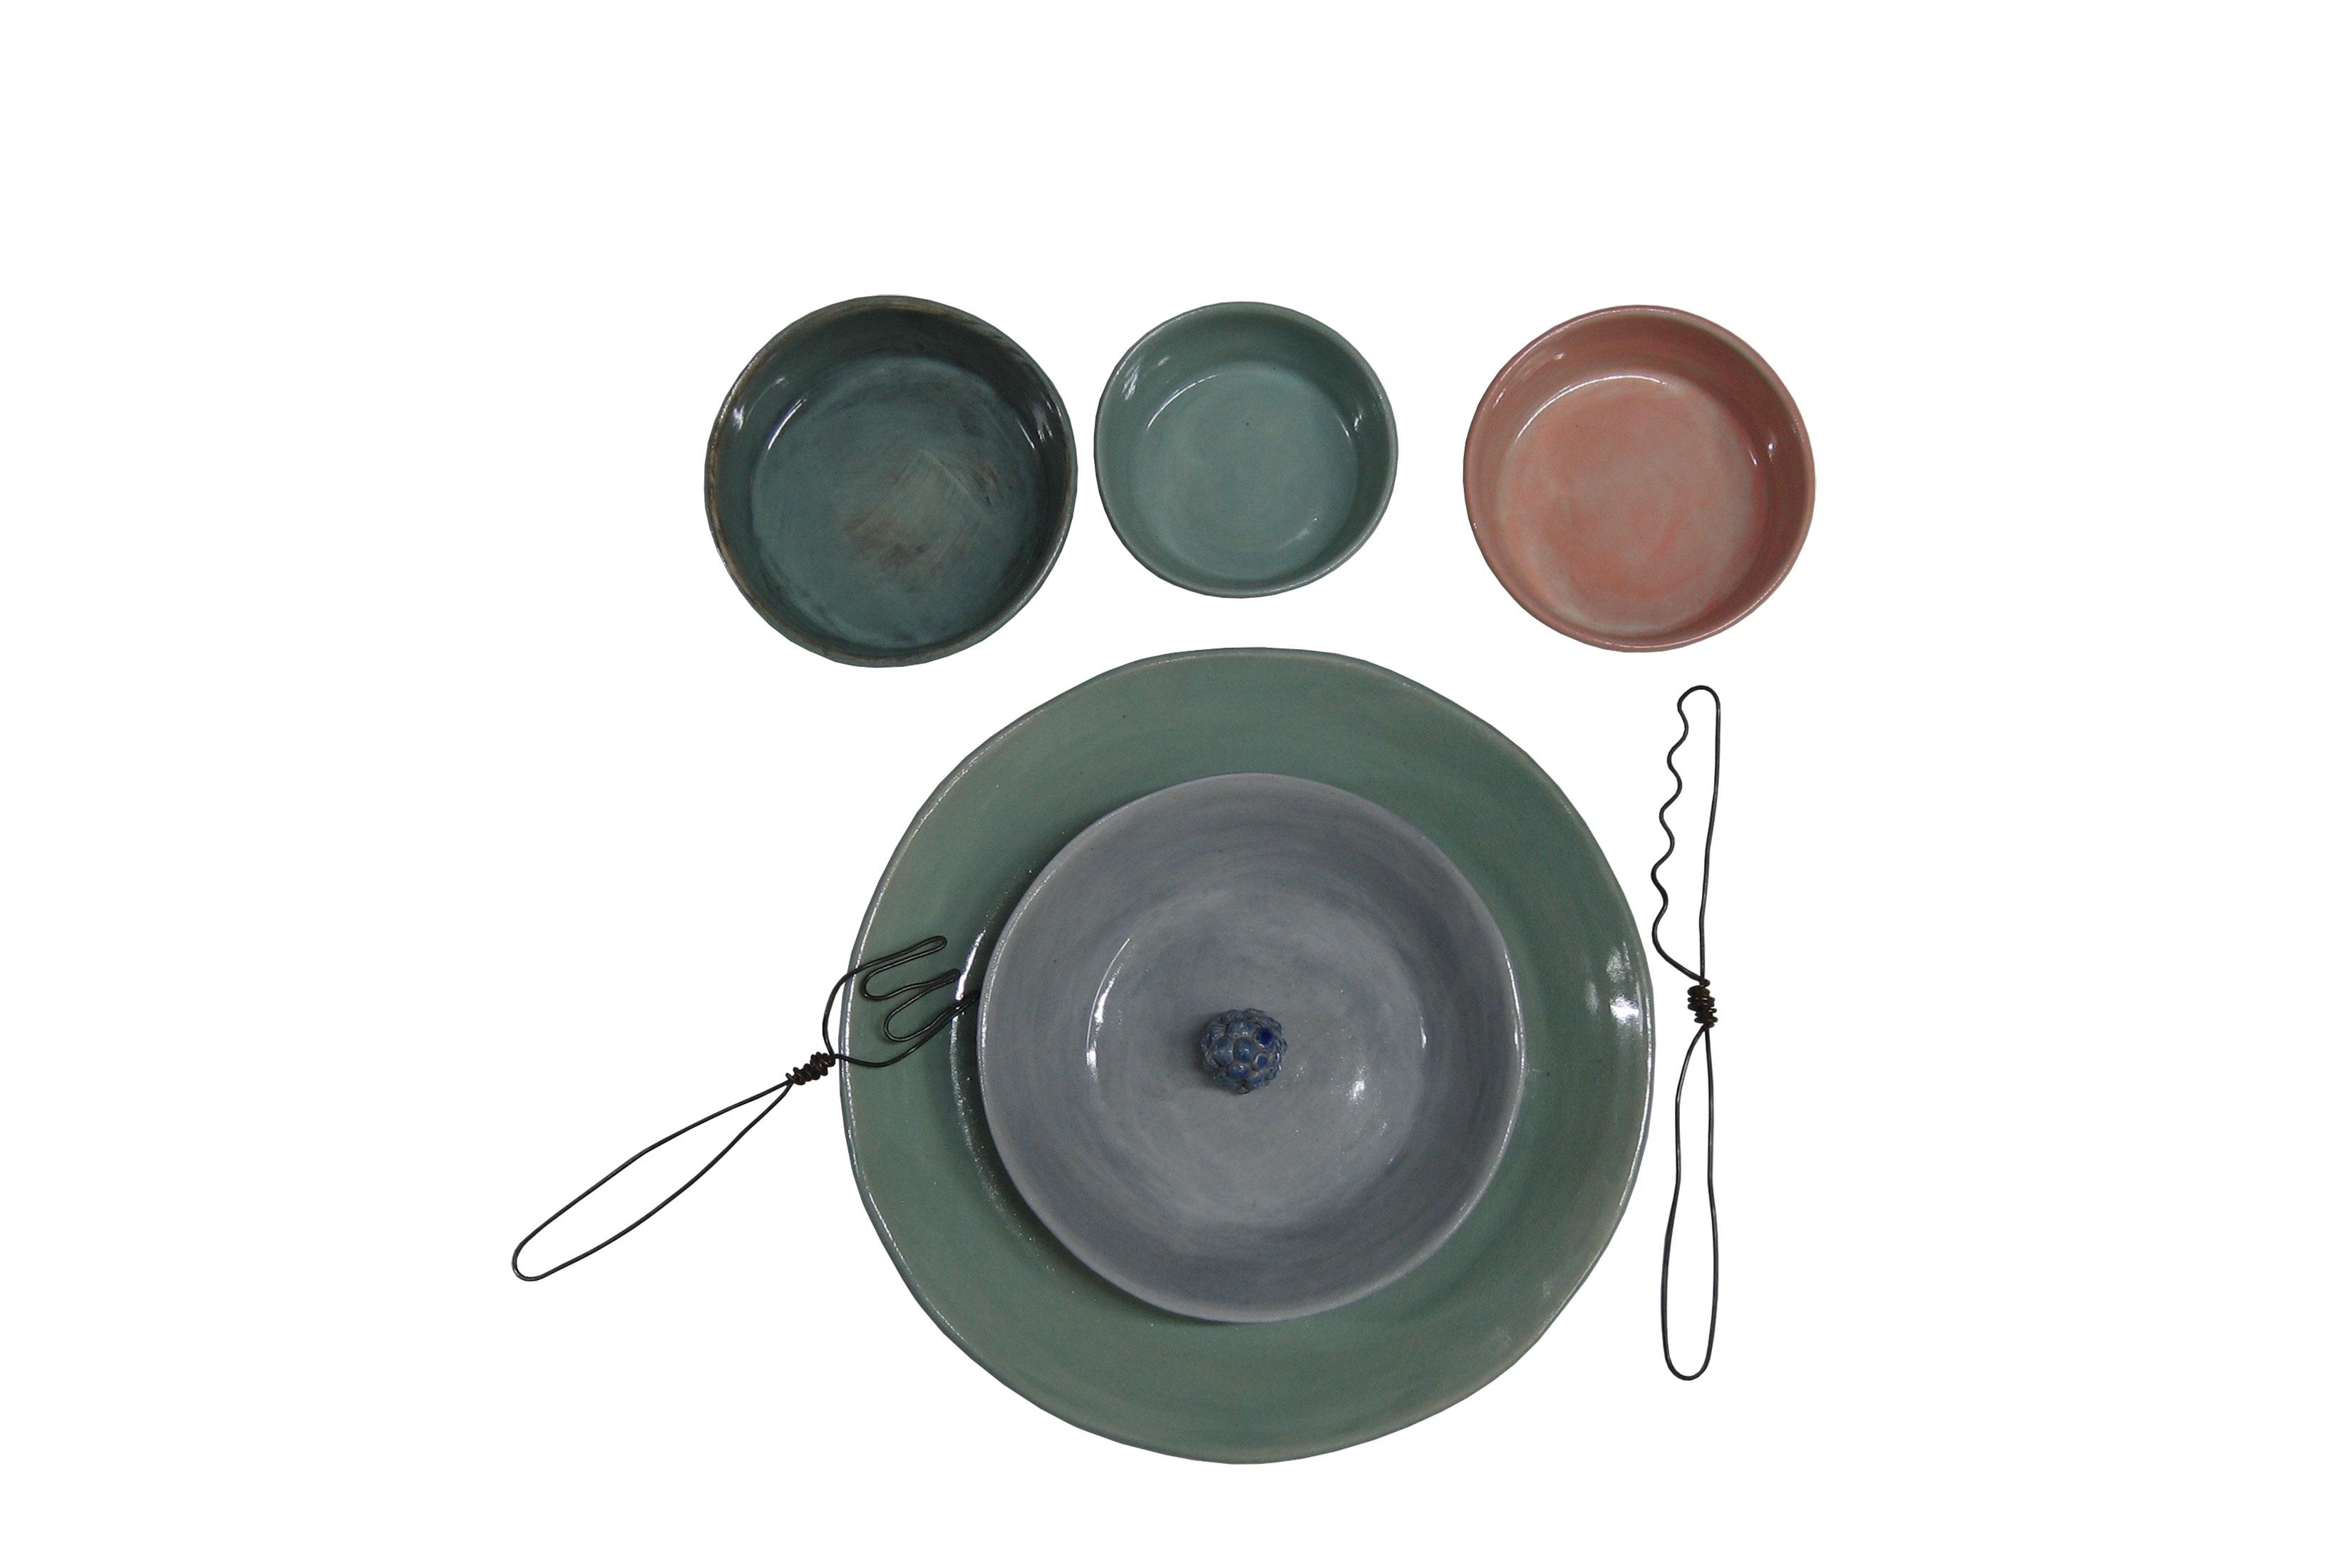 medi zimmermann galerie metzger gallery keramik gefaeß art ceramics